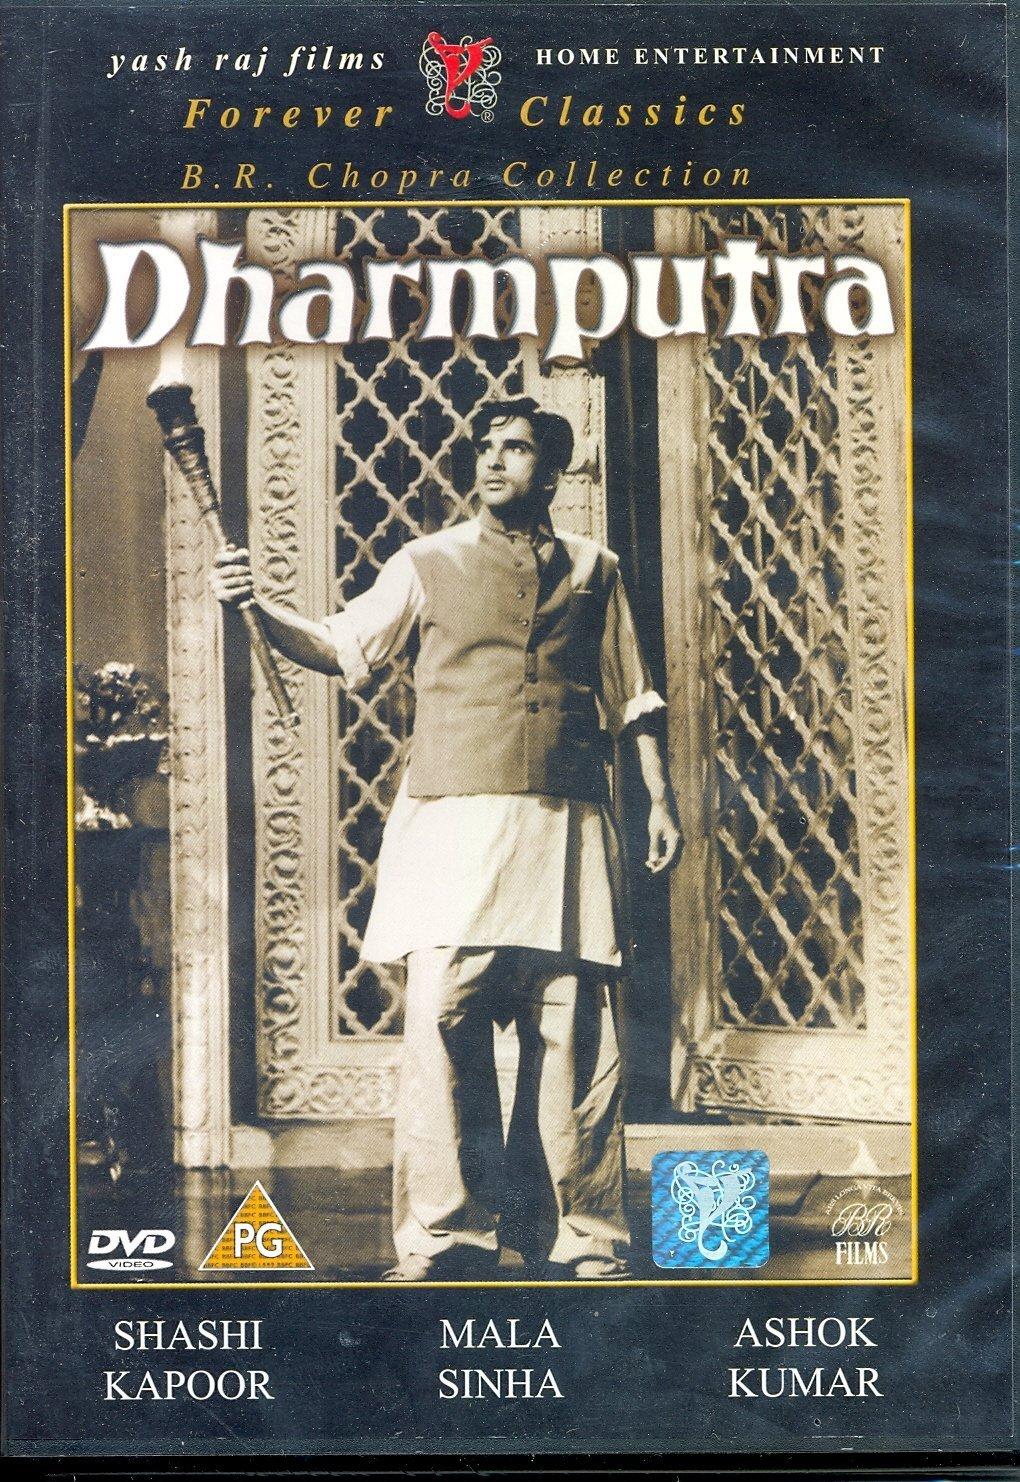 Dharmputra Image